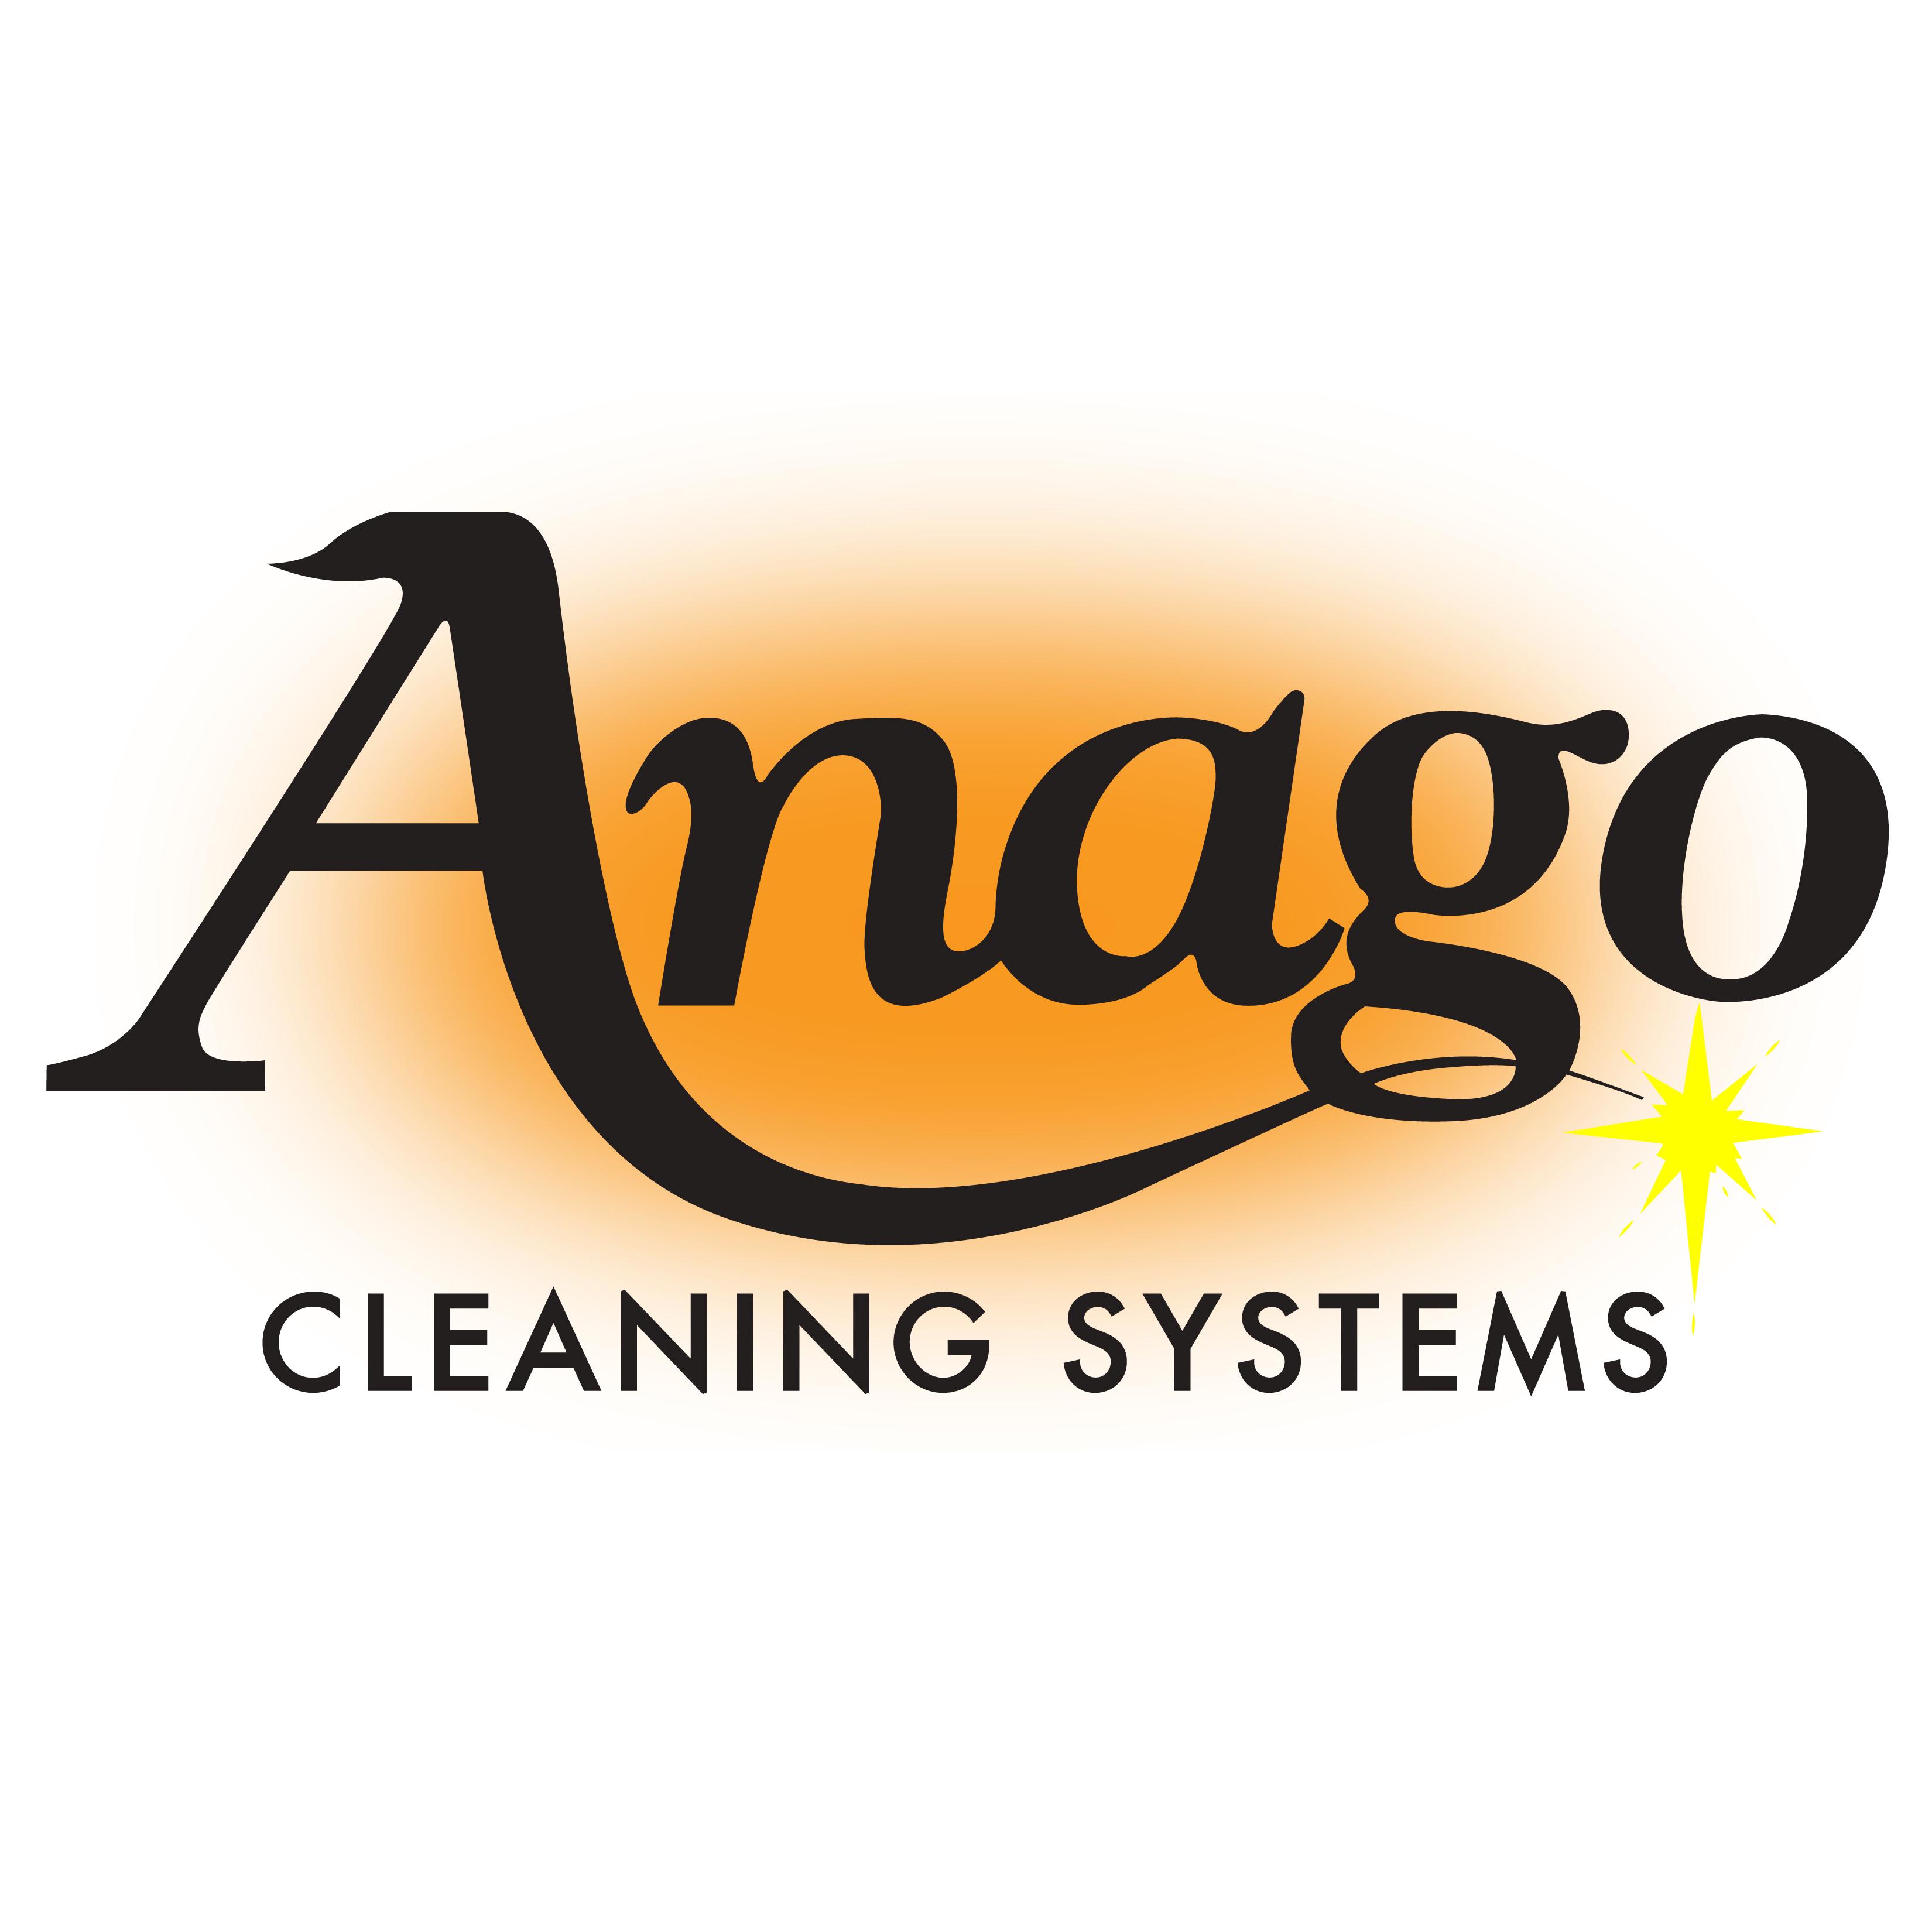 Anago of Denver